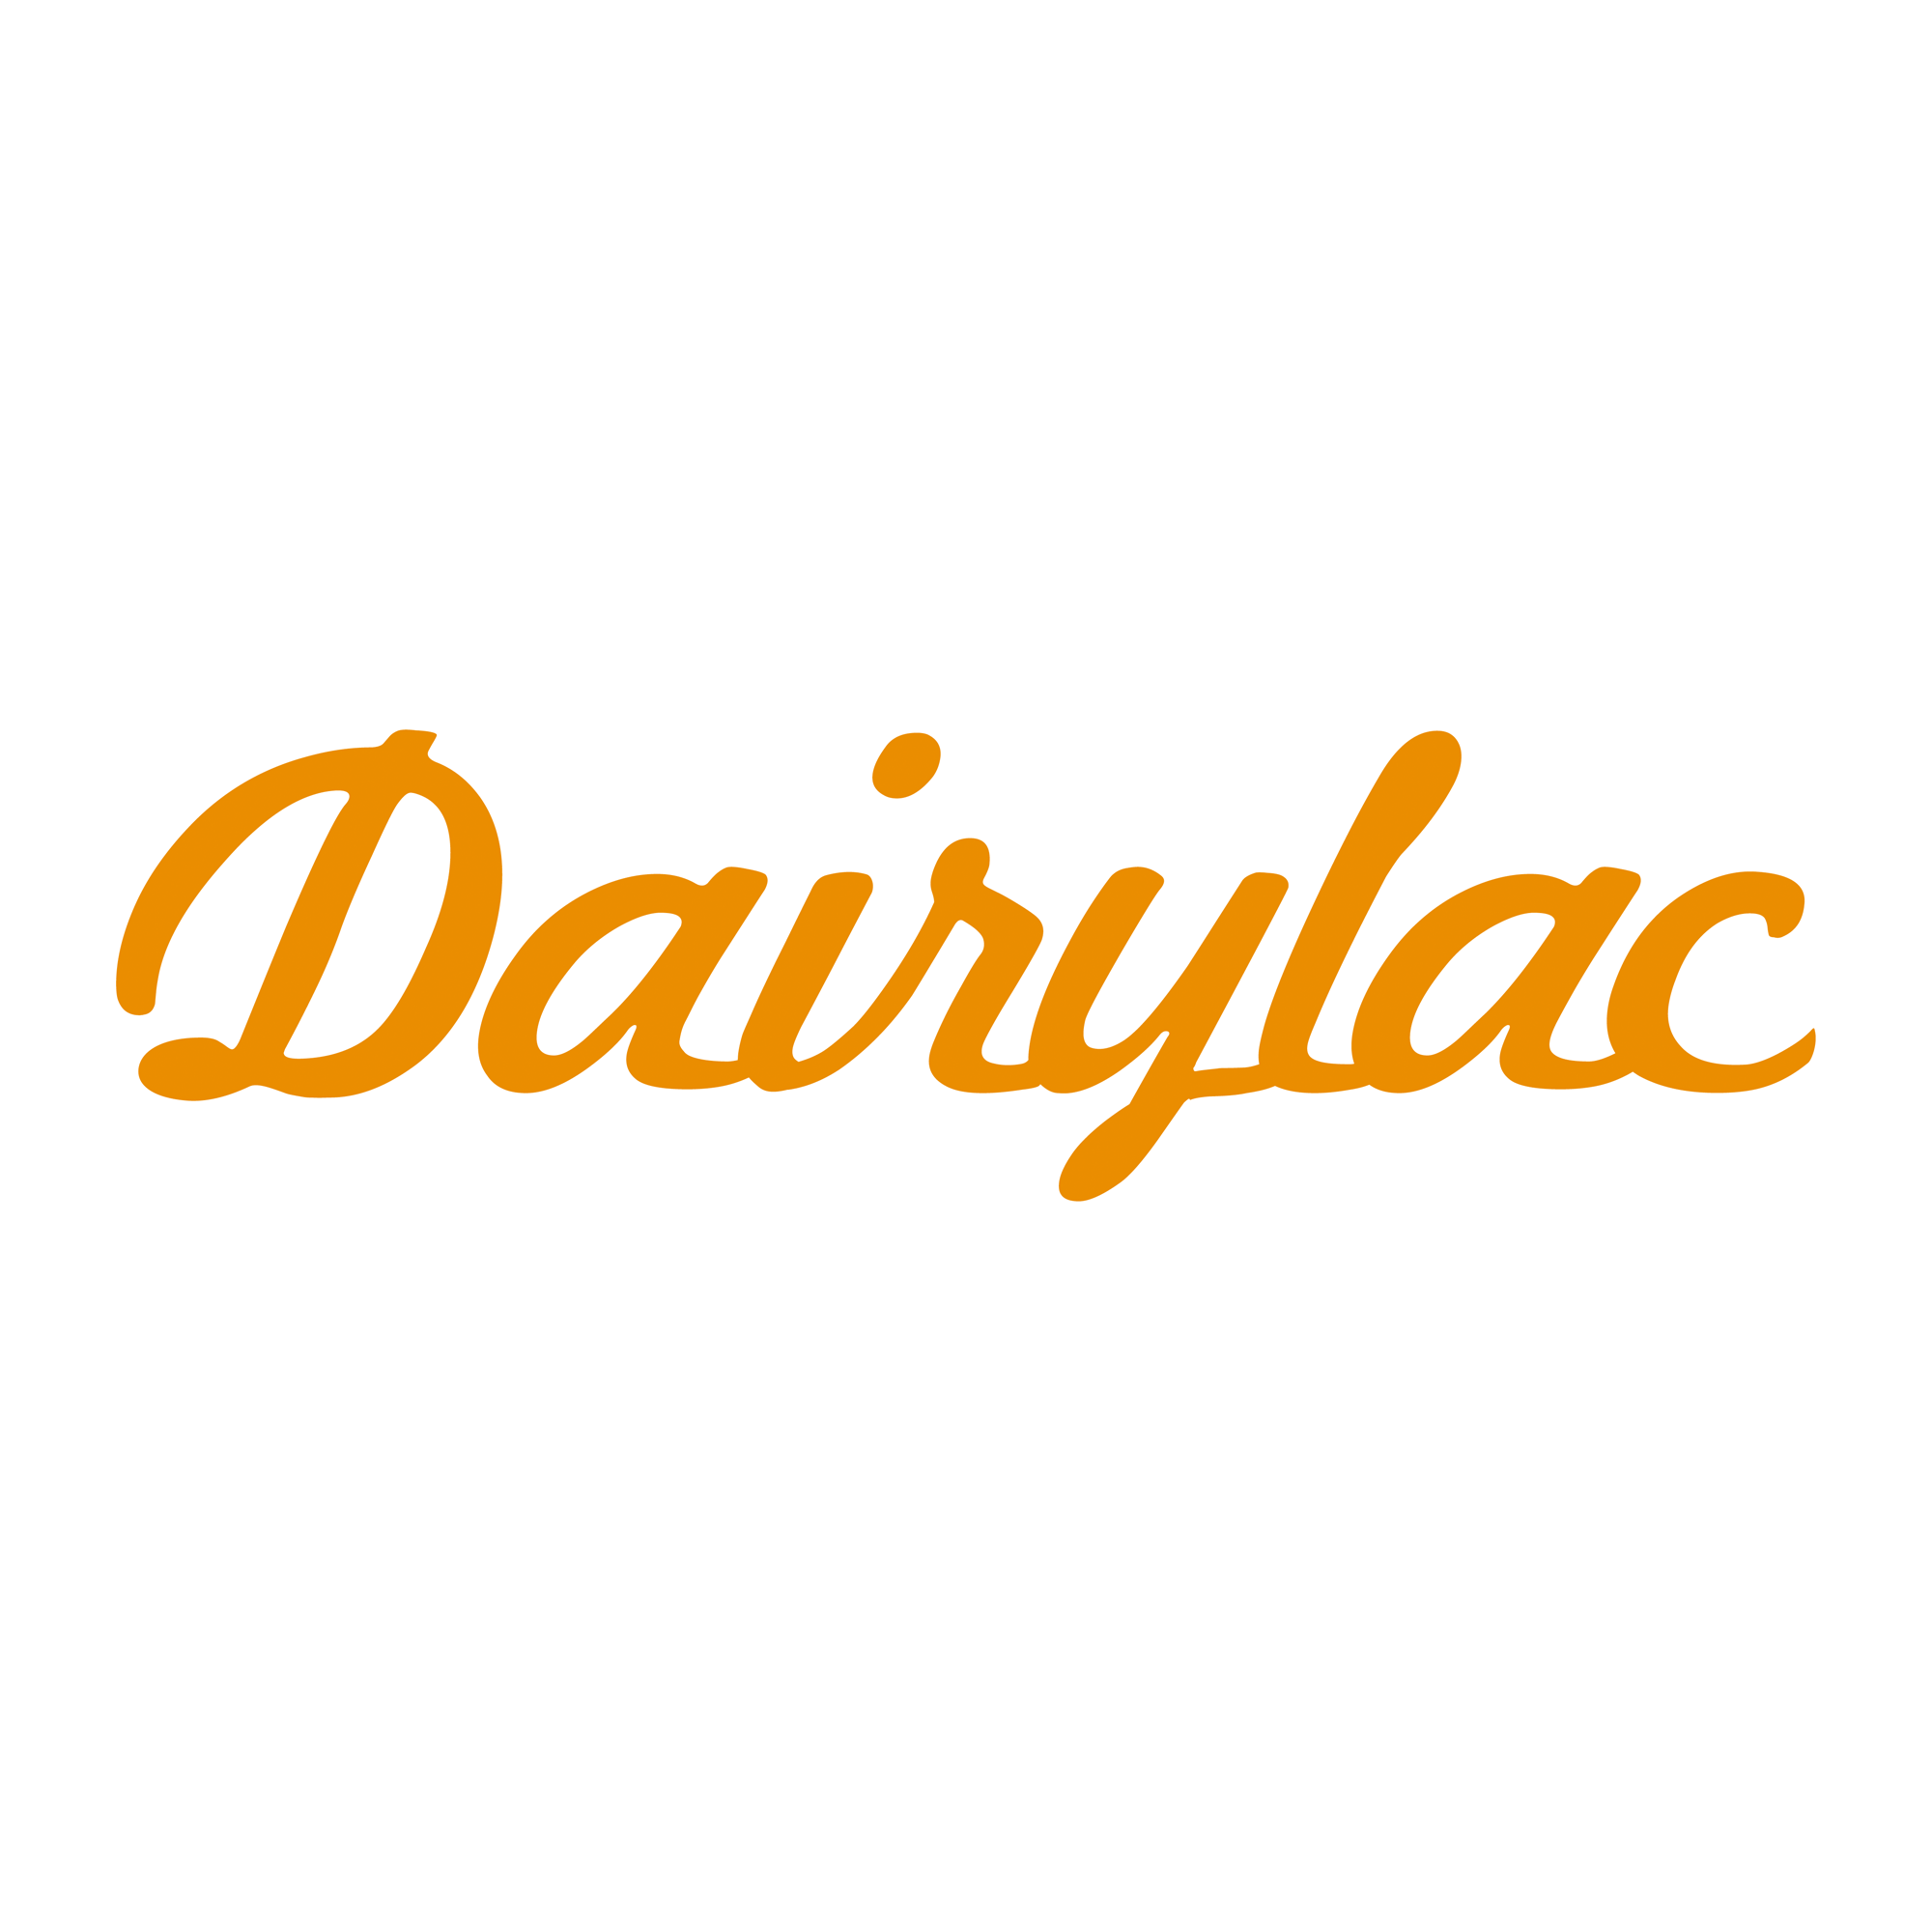 Dairylac